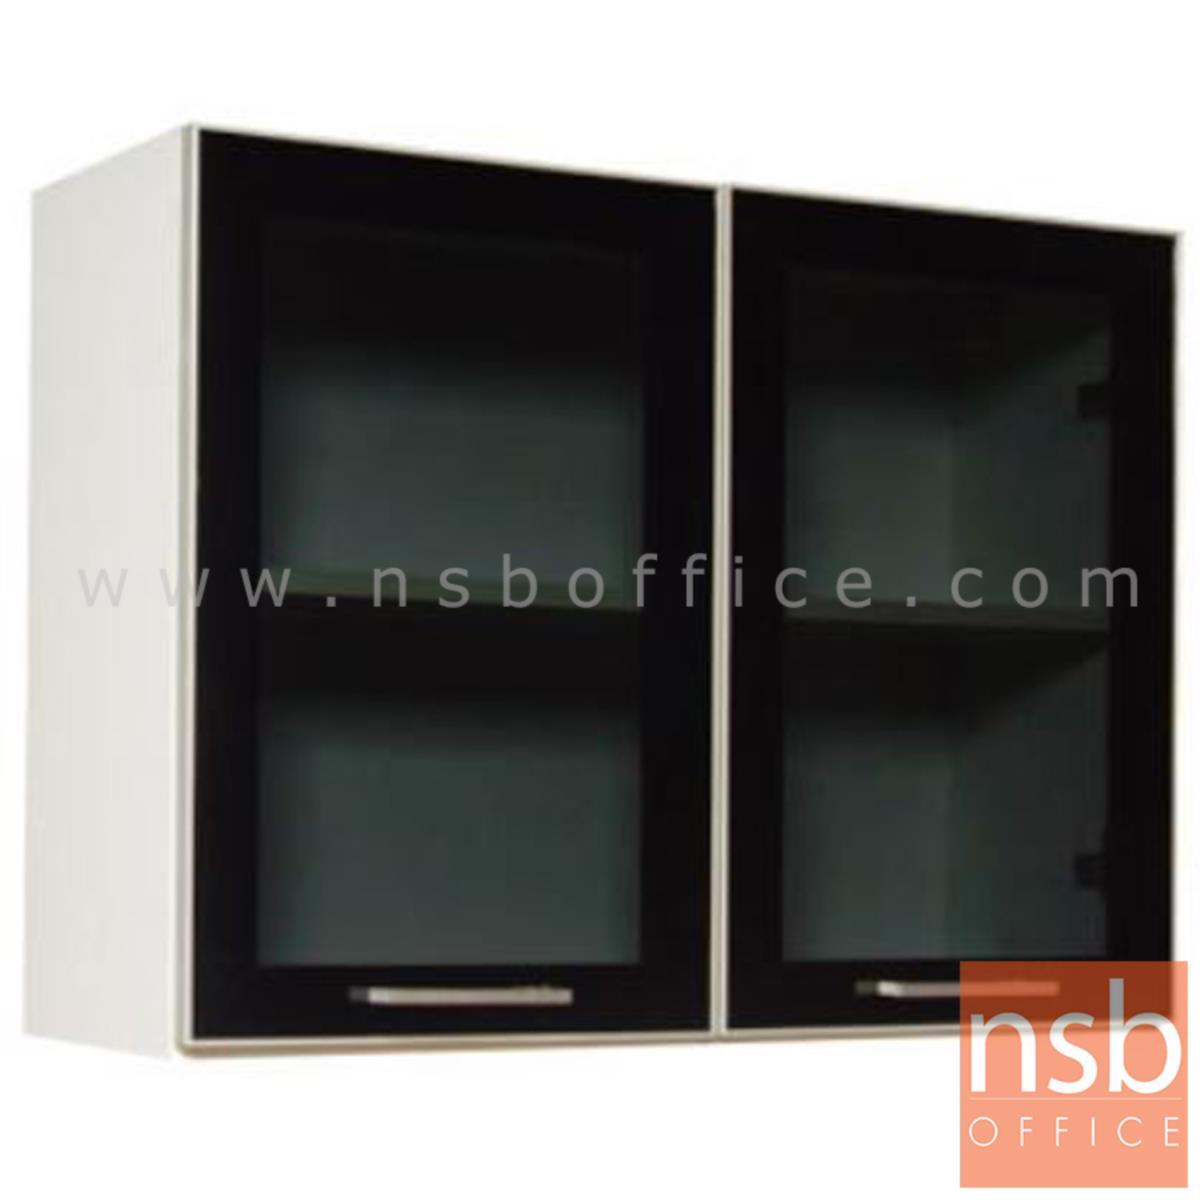 K01A016:ตู้แขวน 2 บานเปิดกระจก   ขนาด 60H cm.